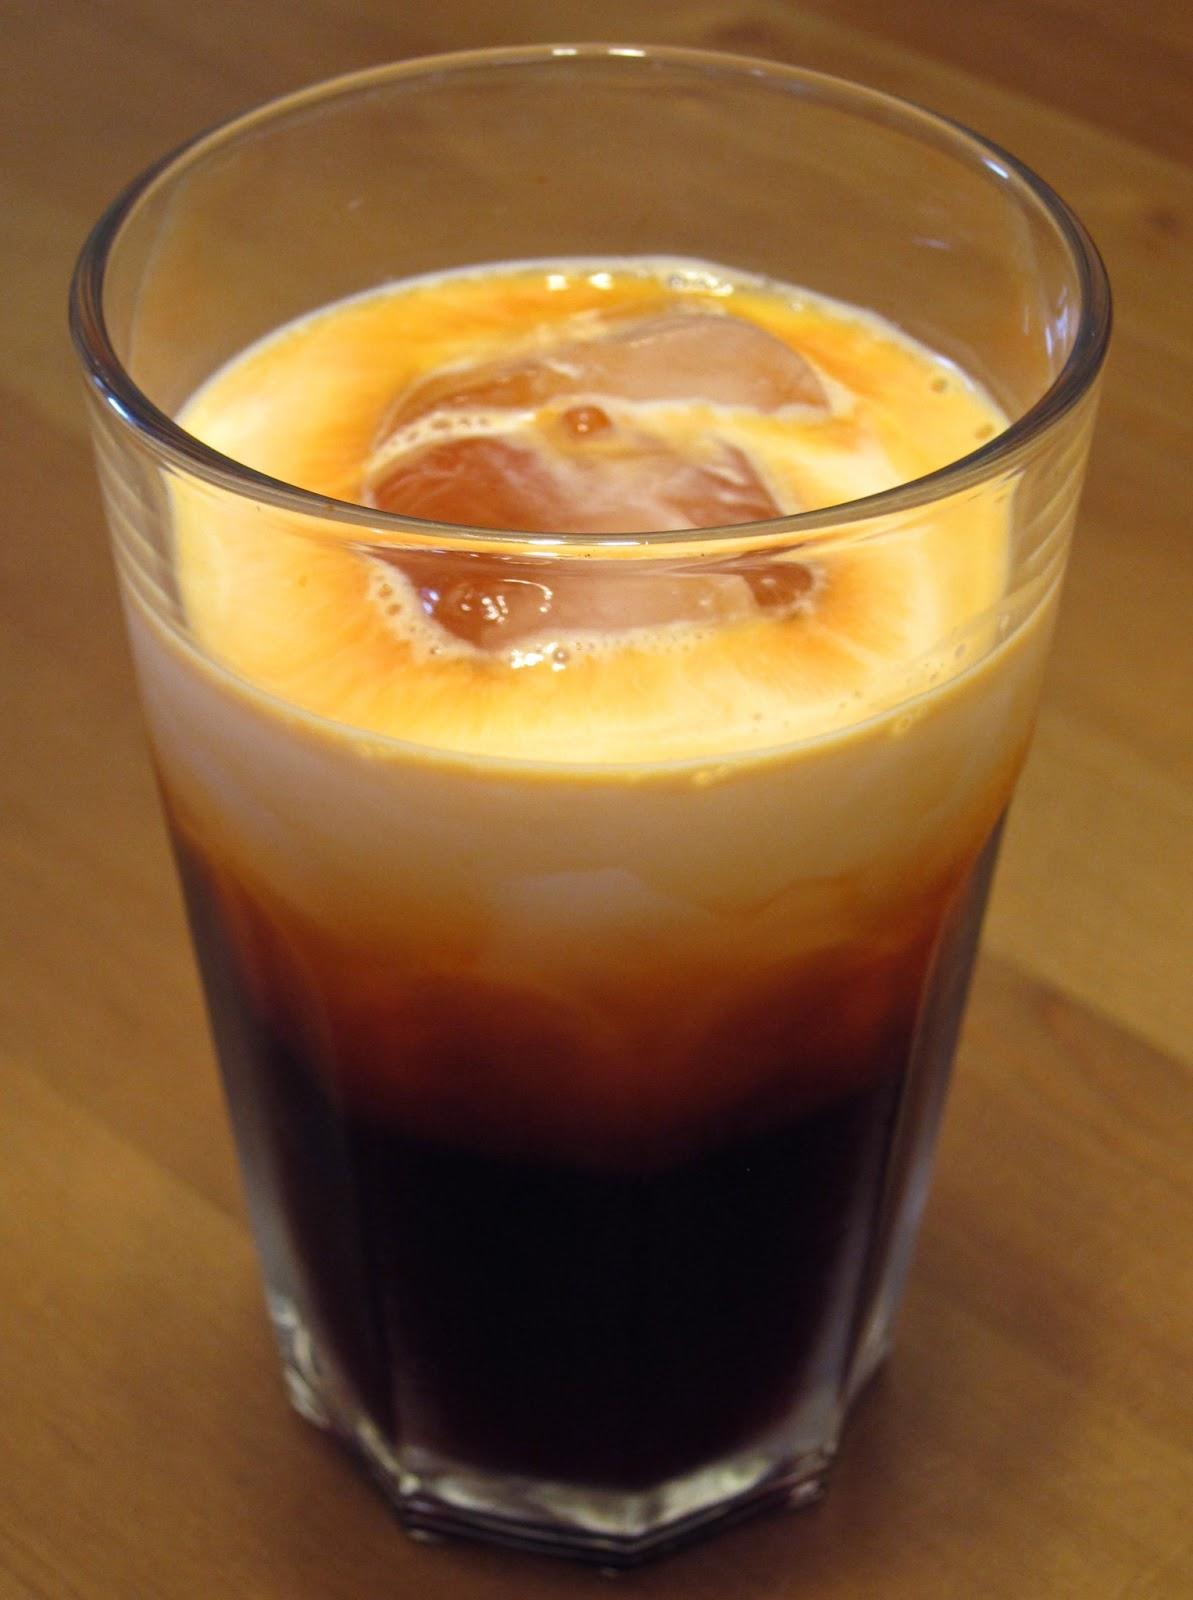 Dissolving Sugar in Tea Stir Sugar Into Tea Until